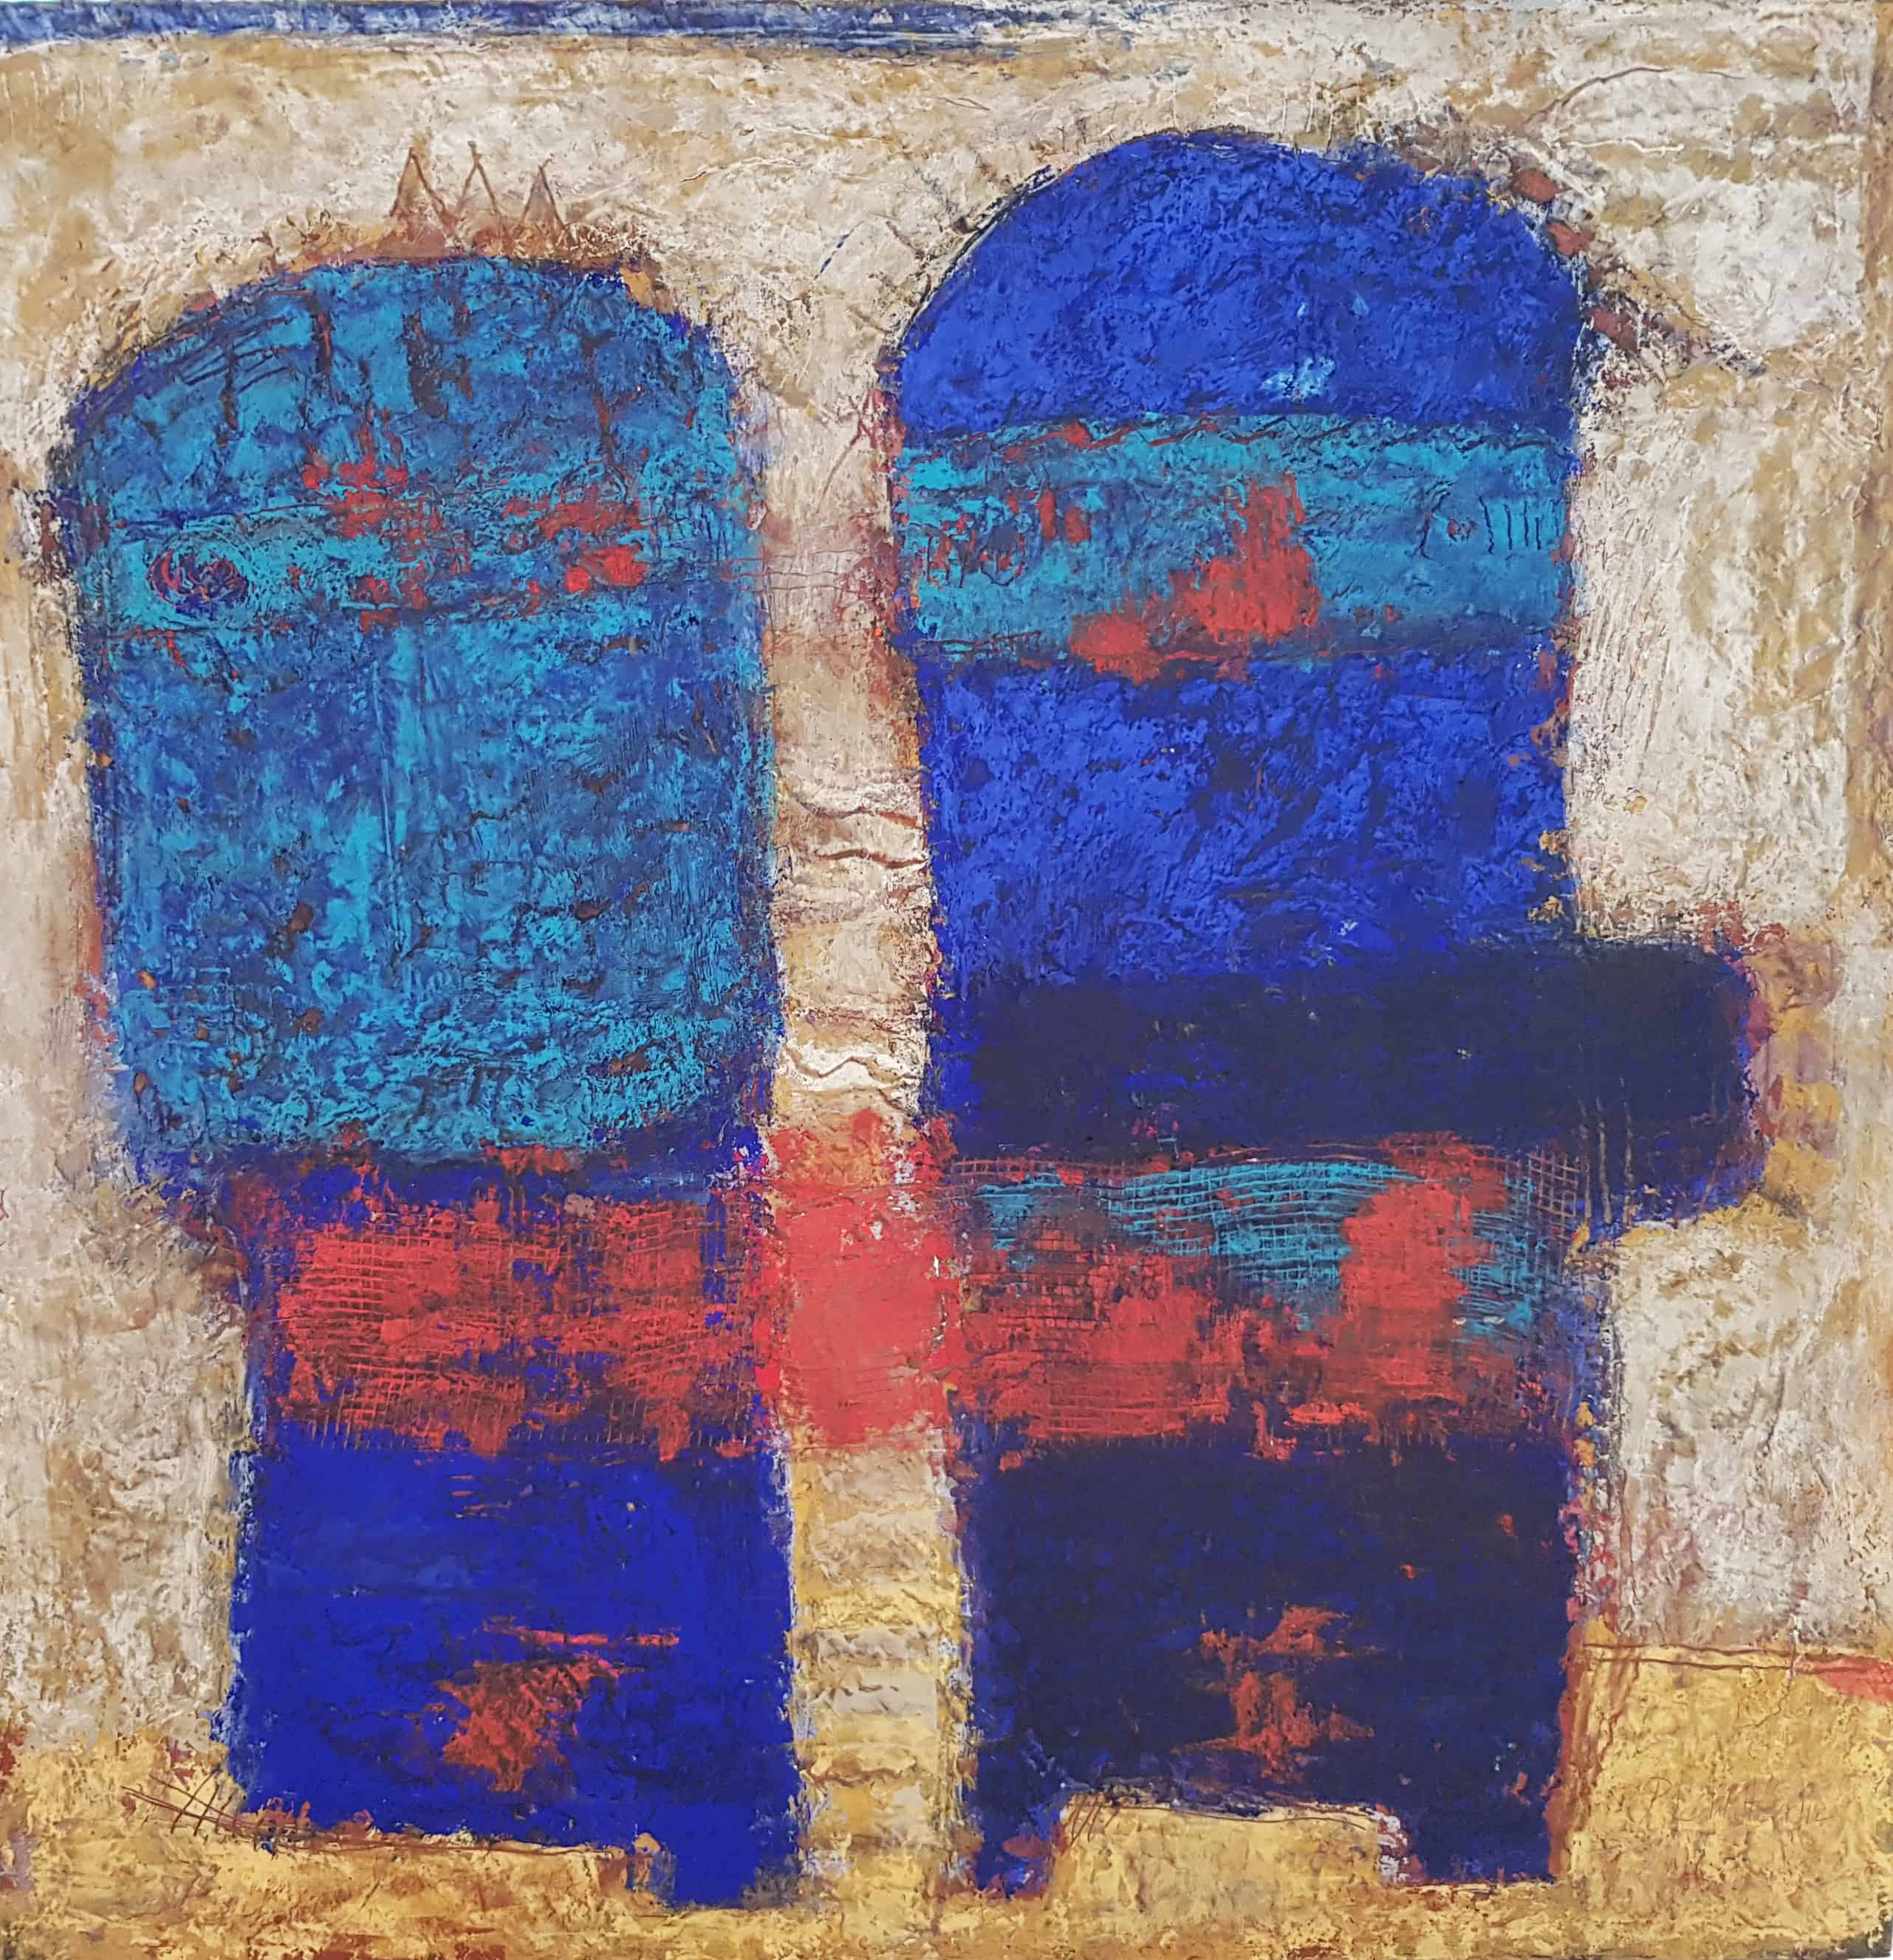 FERIA Artiste Peintre Galerie d'Art Sylvie Platini Lyon Annecy